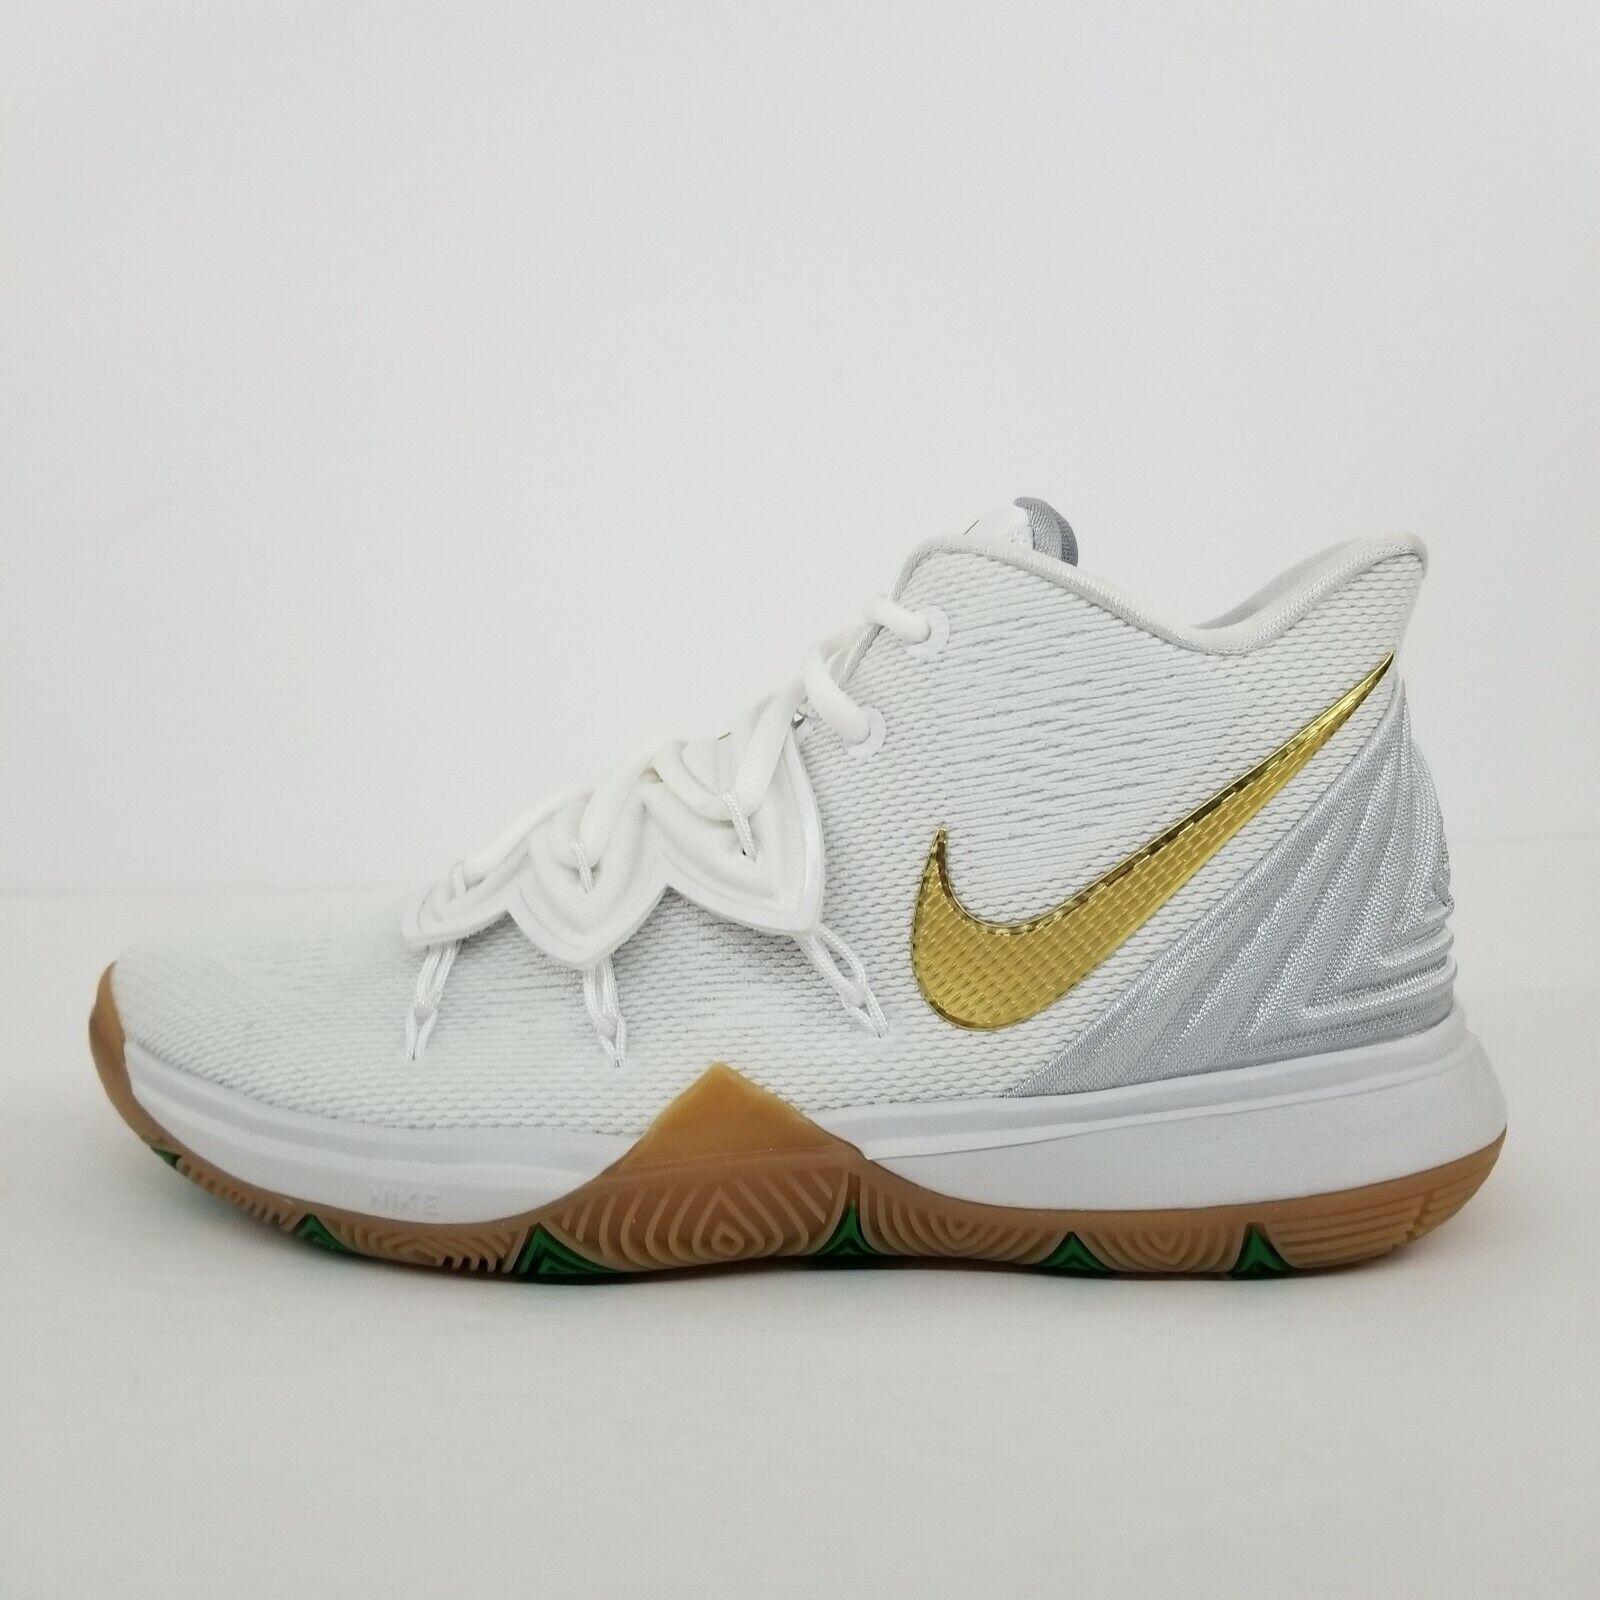 Nike Kyrie 5 (GS) Irish White Metallic